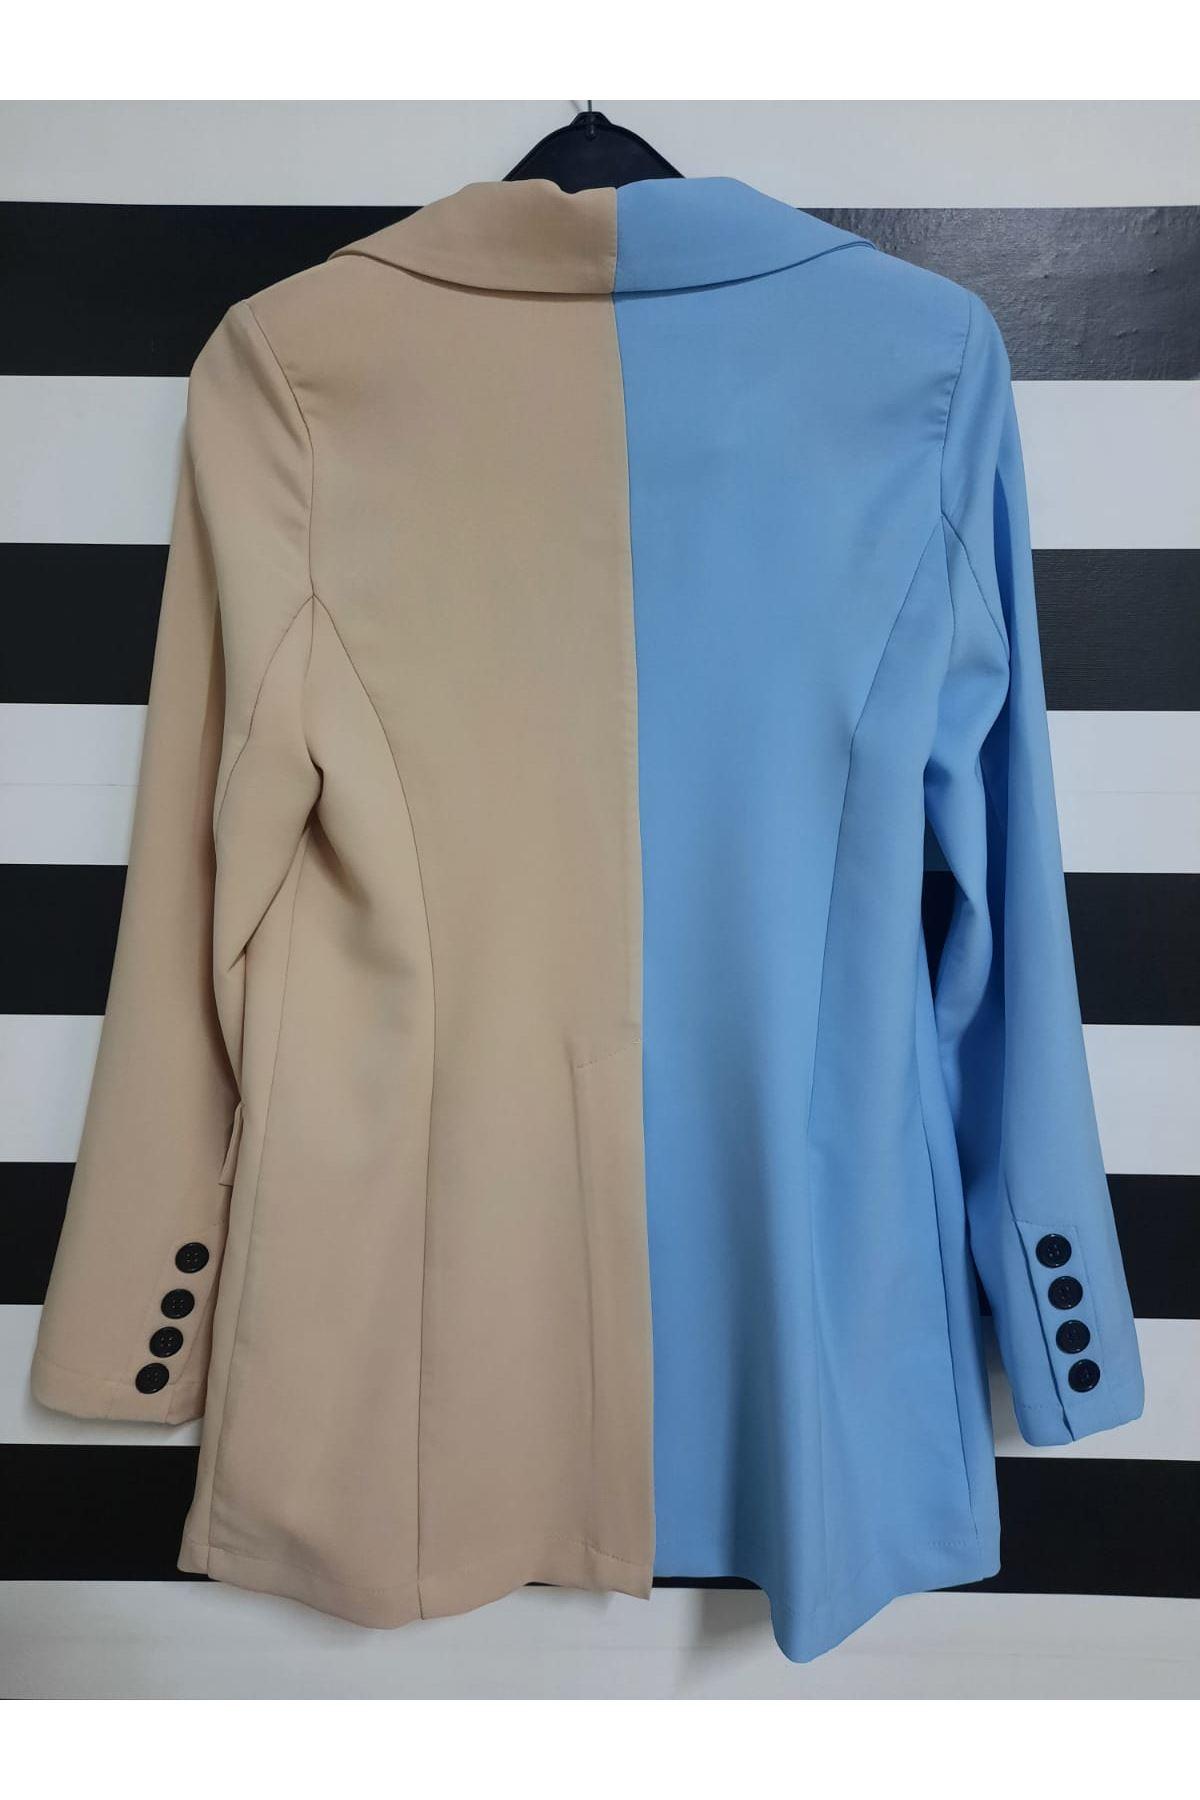 Çift Renk Blazer Ceket - MAVİ